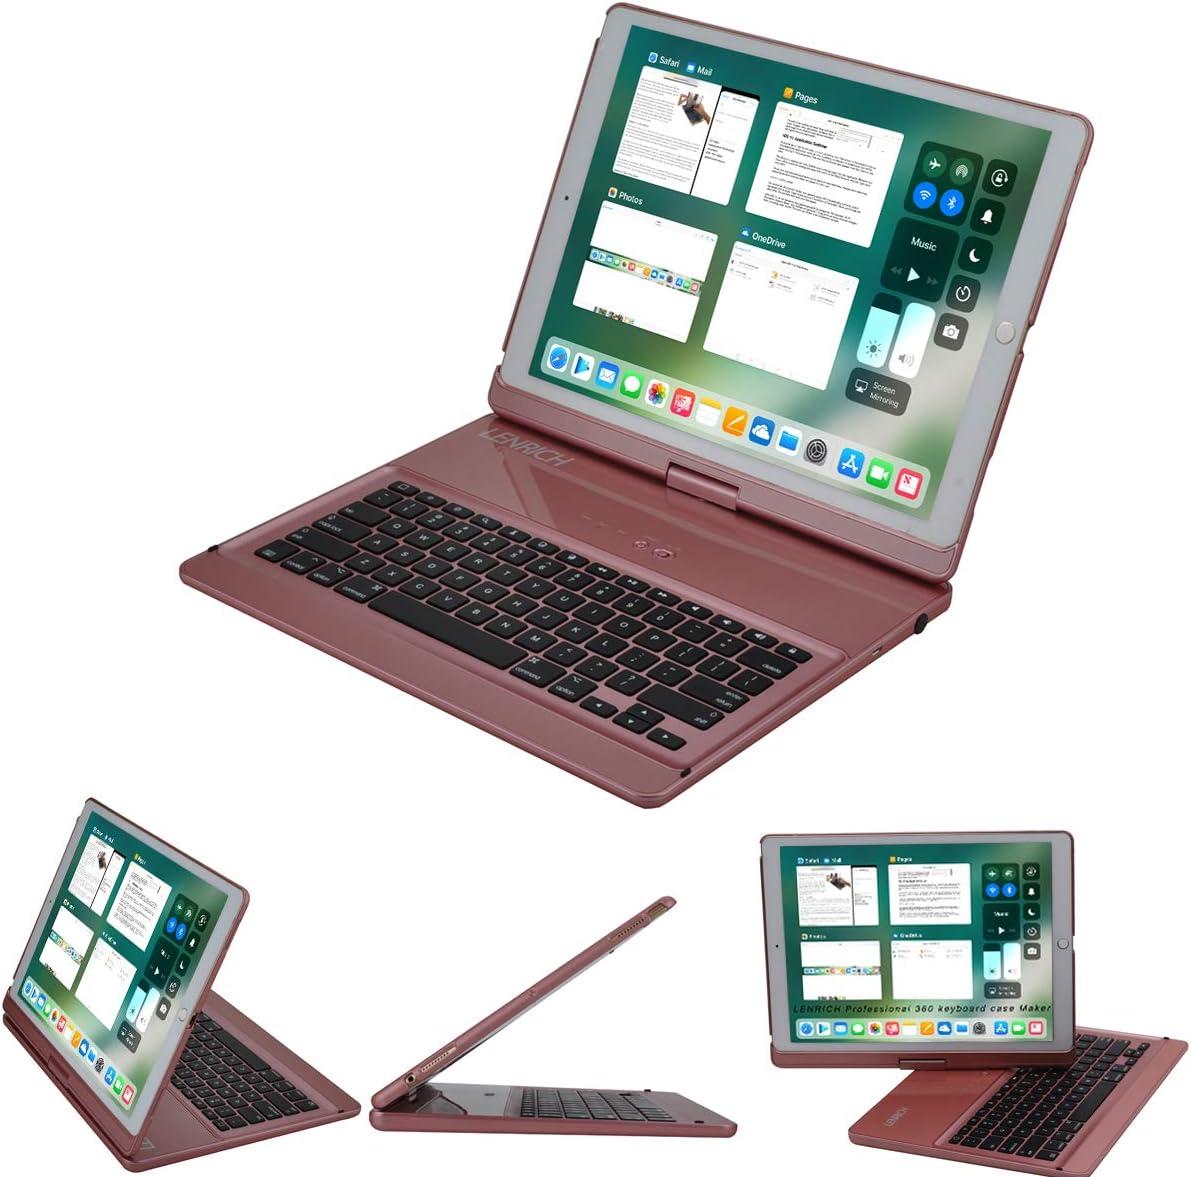 LENRICH iPad pro 12.9 Keyboard case 2017 2nd 2015 1st Gen,360 Rotatable Wireless Keyboard Smart Folio 180 Swivel Stand Hard Shell Cover Auto Sleep/Wake up Rose Gold